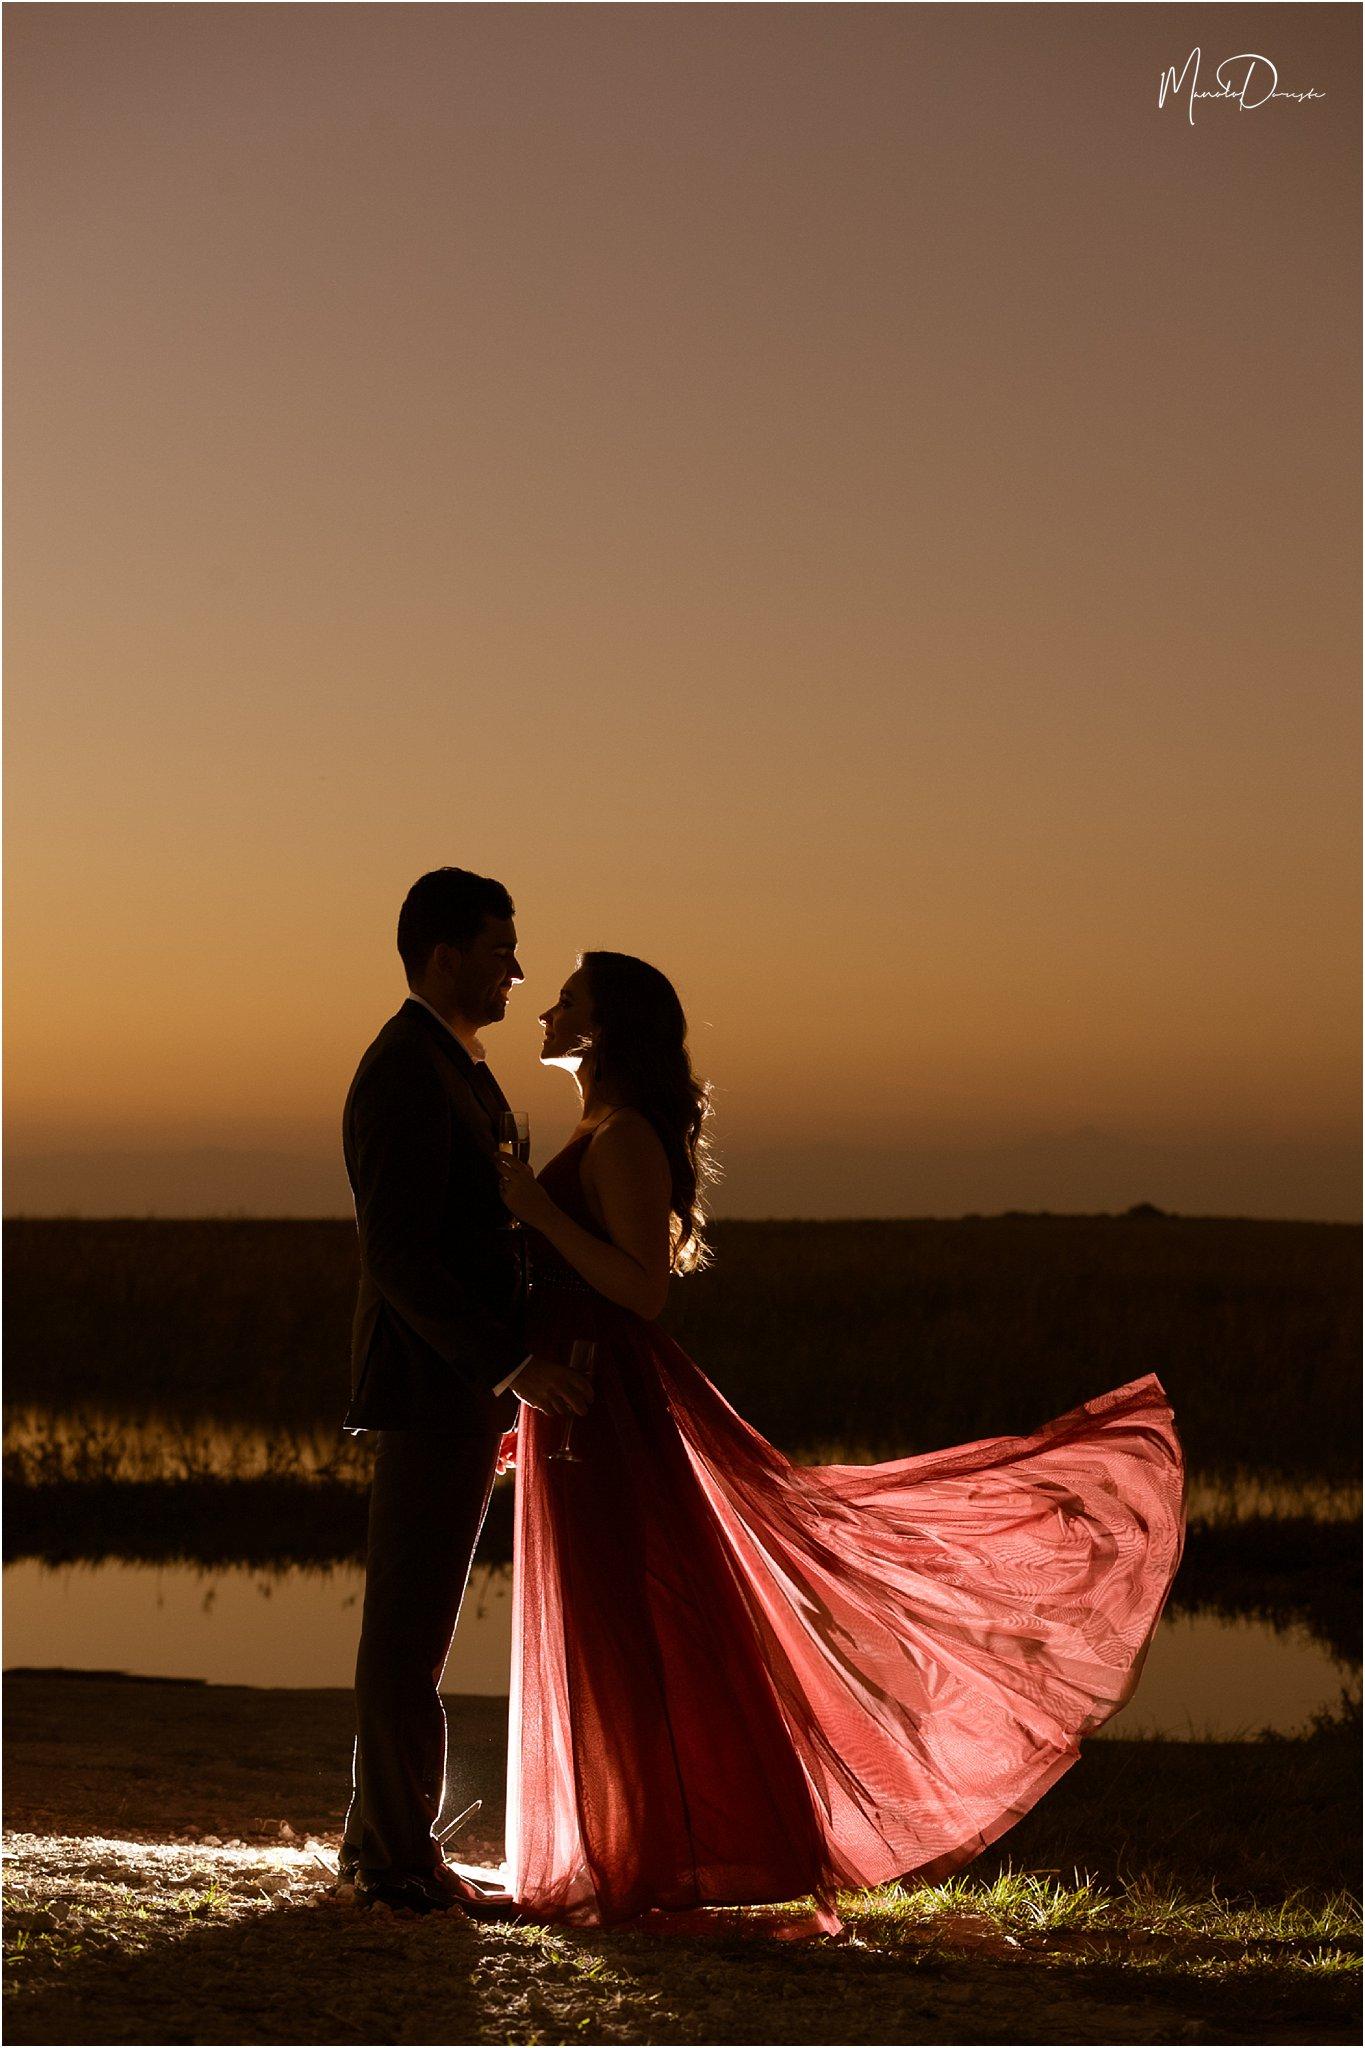 00828_ManoloDoreste_InFocusStudios_Wedding_Family_Photography_Miami_MiamiPhotographer.jpg